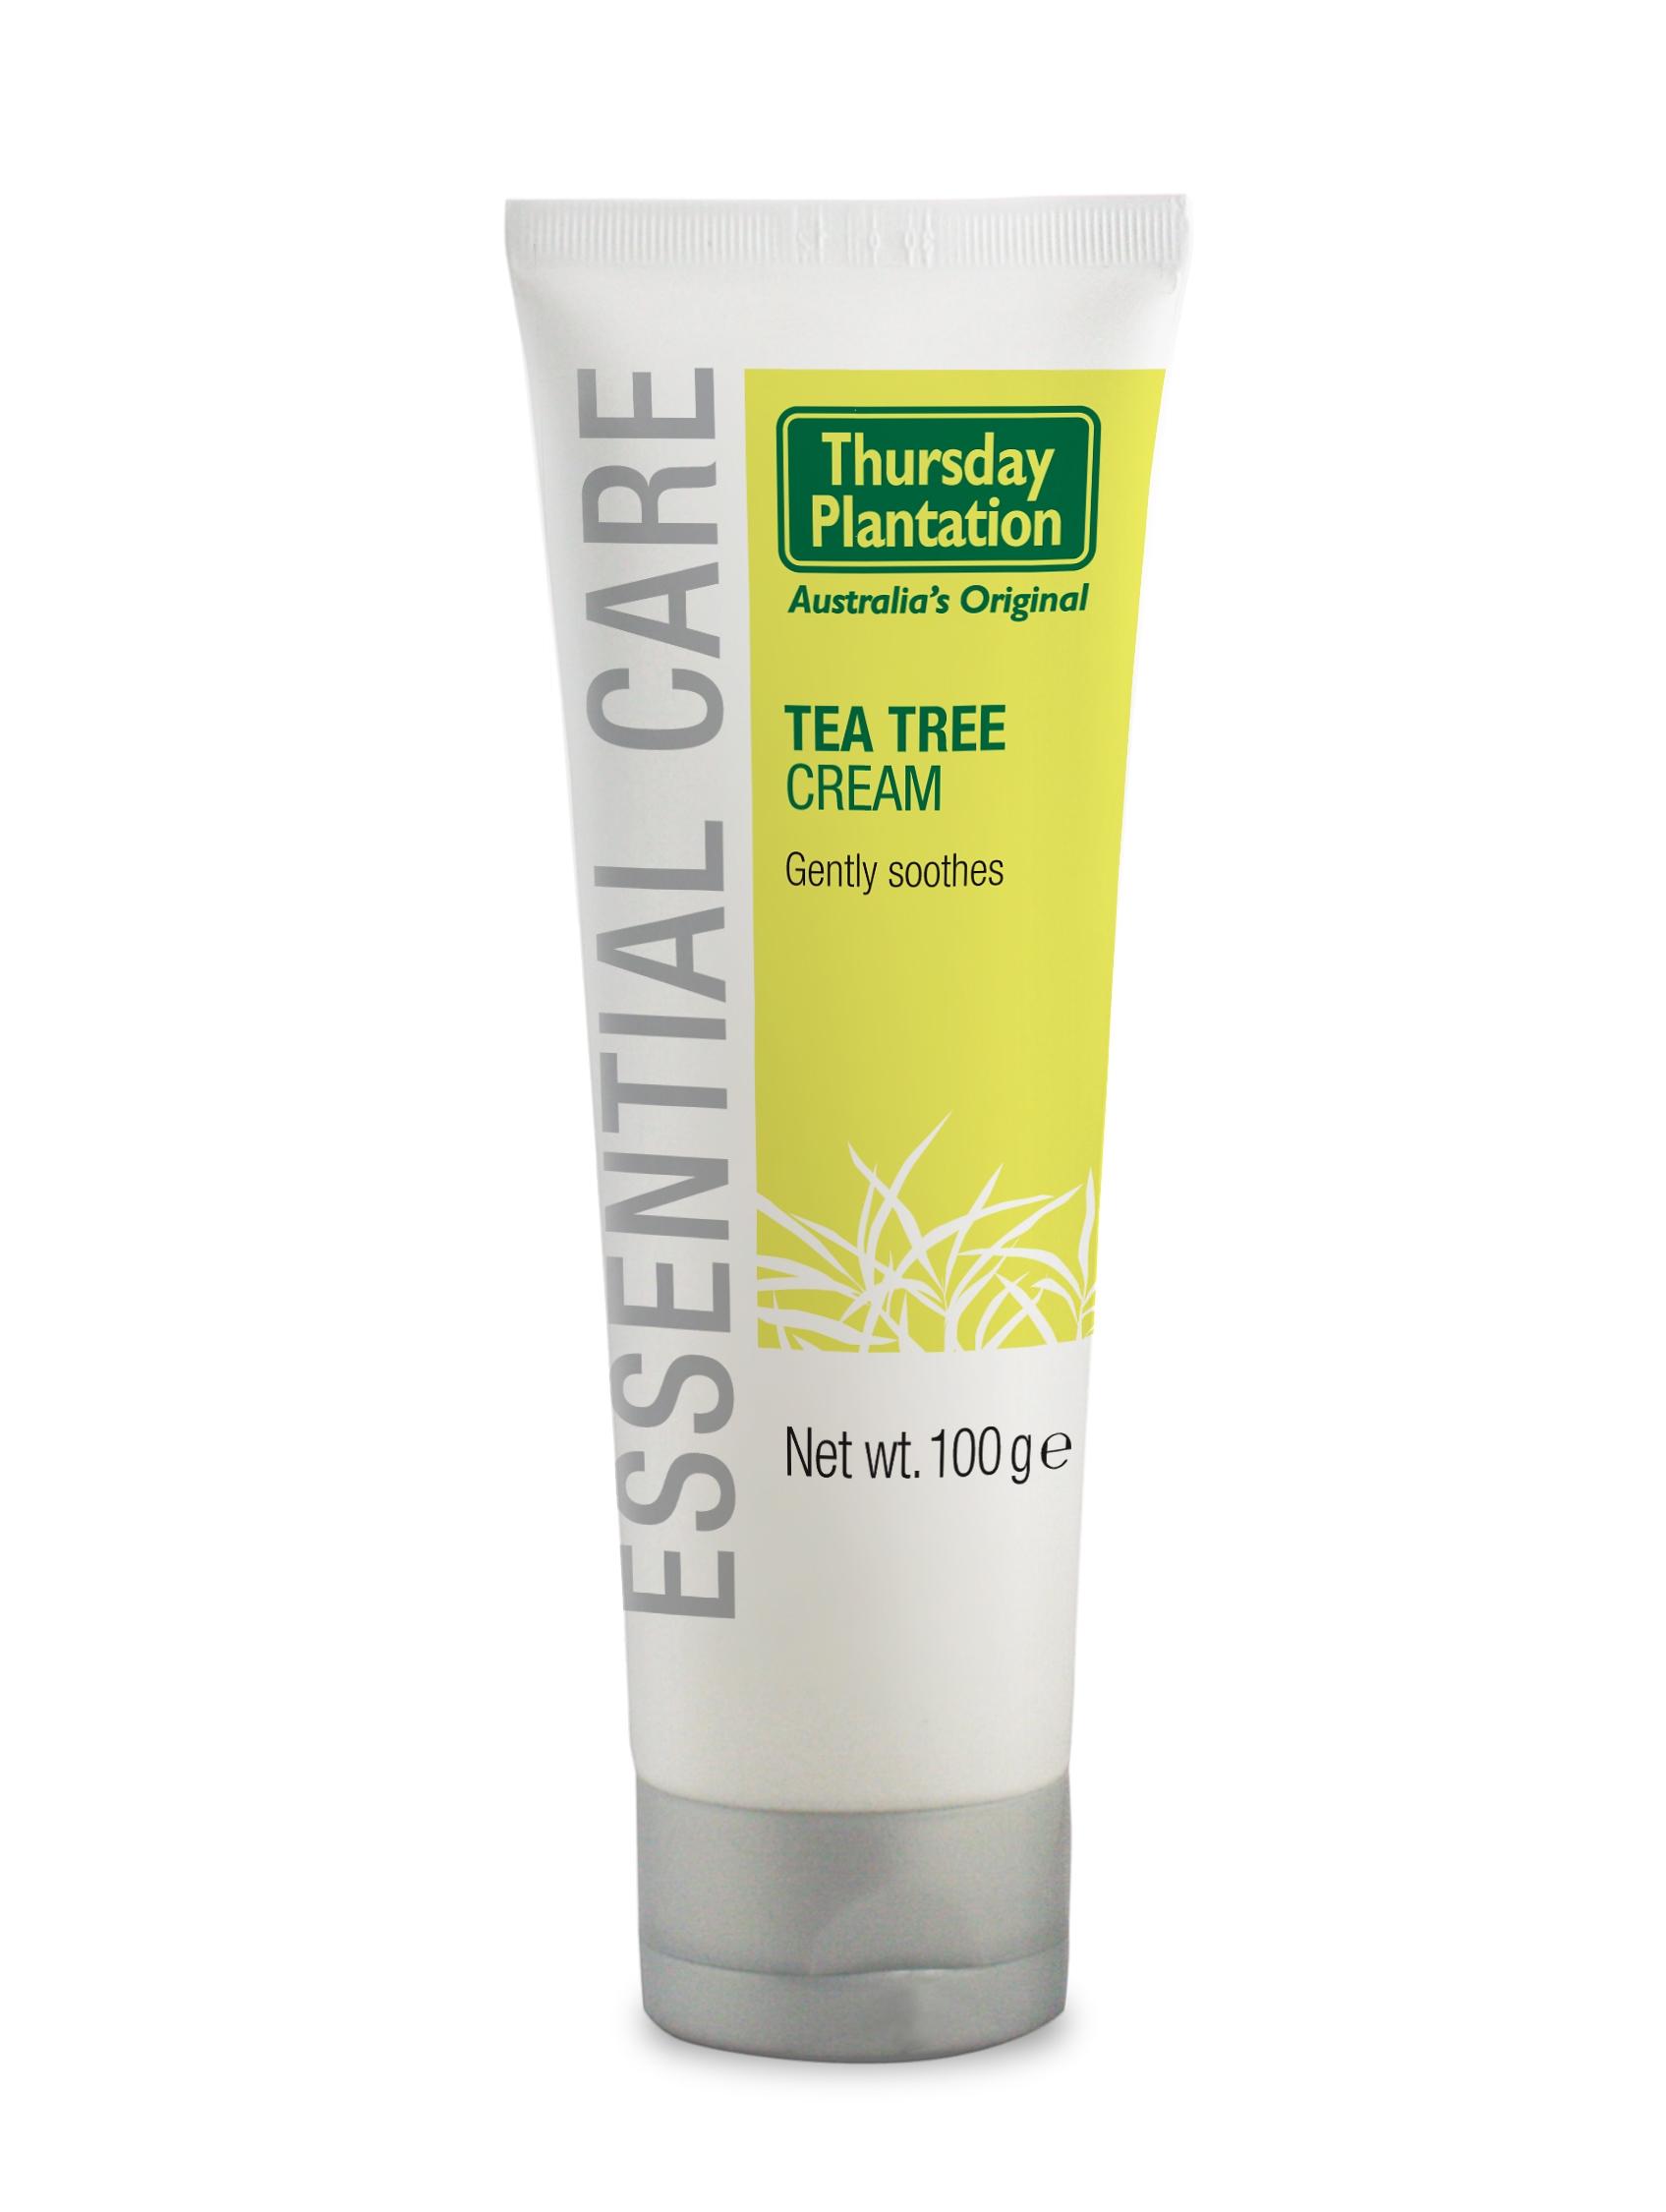 Tea Tree Cream 100g (Currently Unavailable)